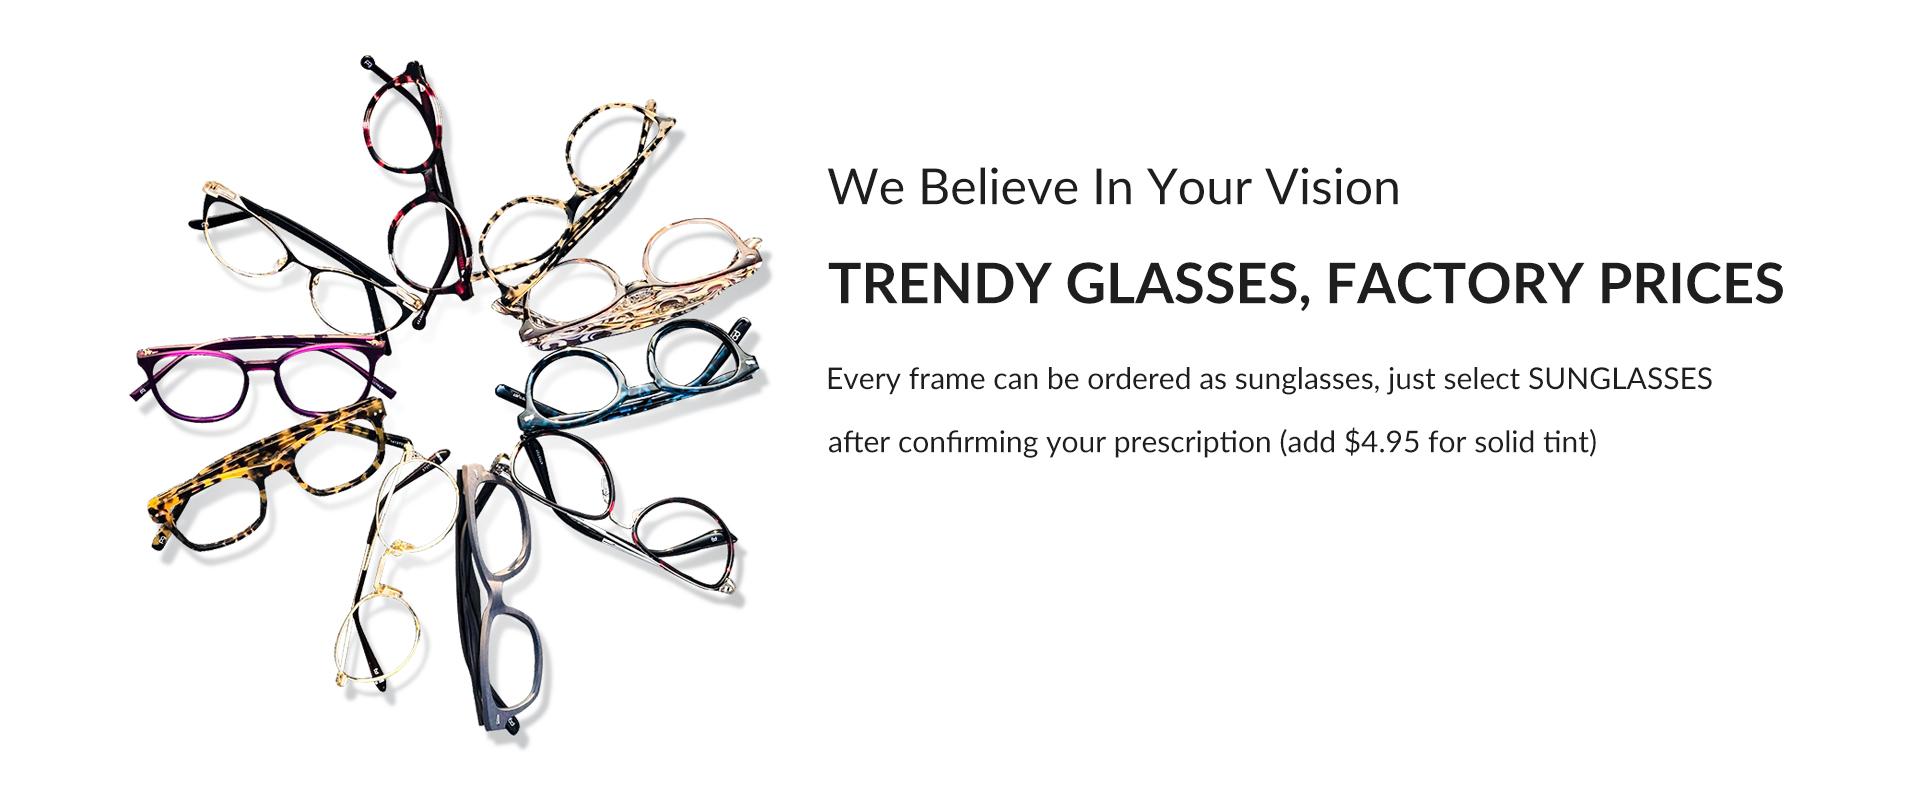 TRENDY-GLASSES-FACTORY-PRICES